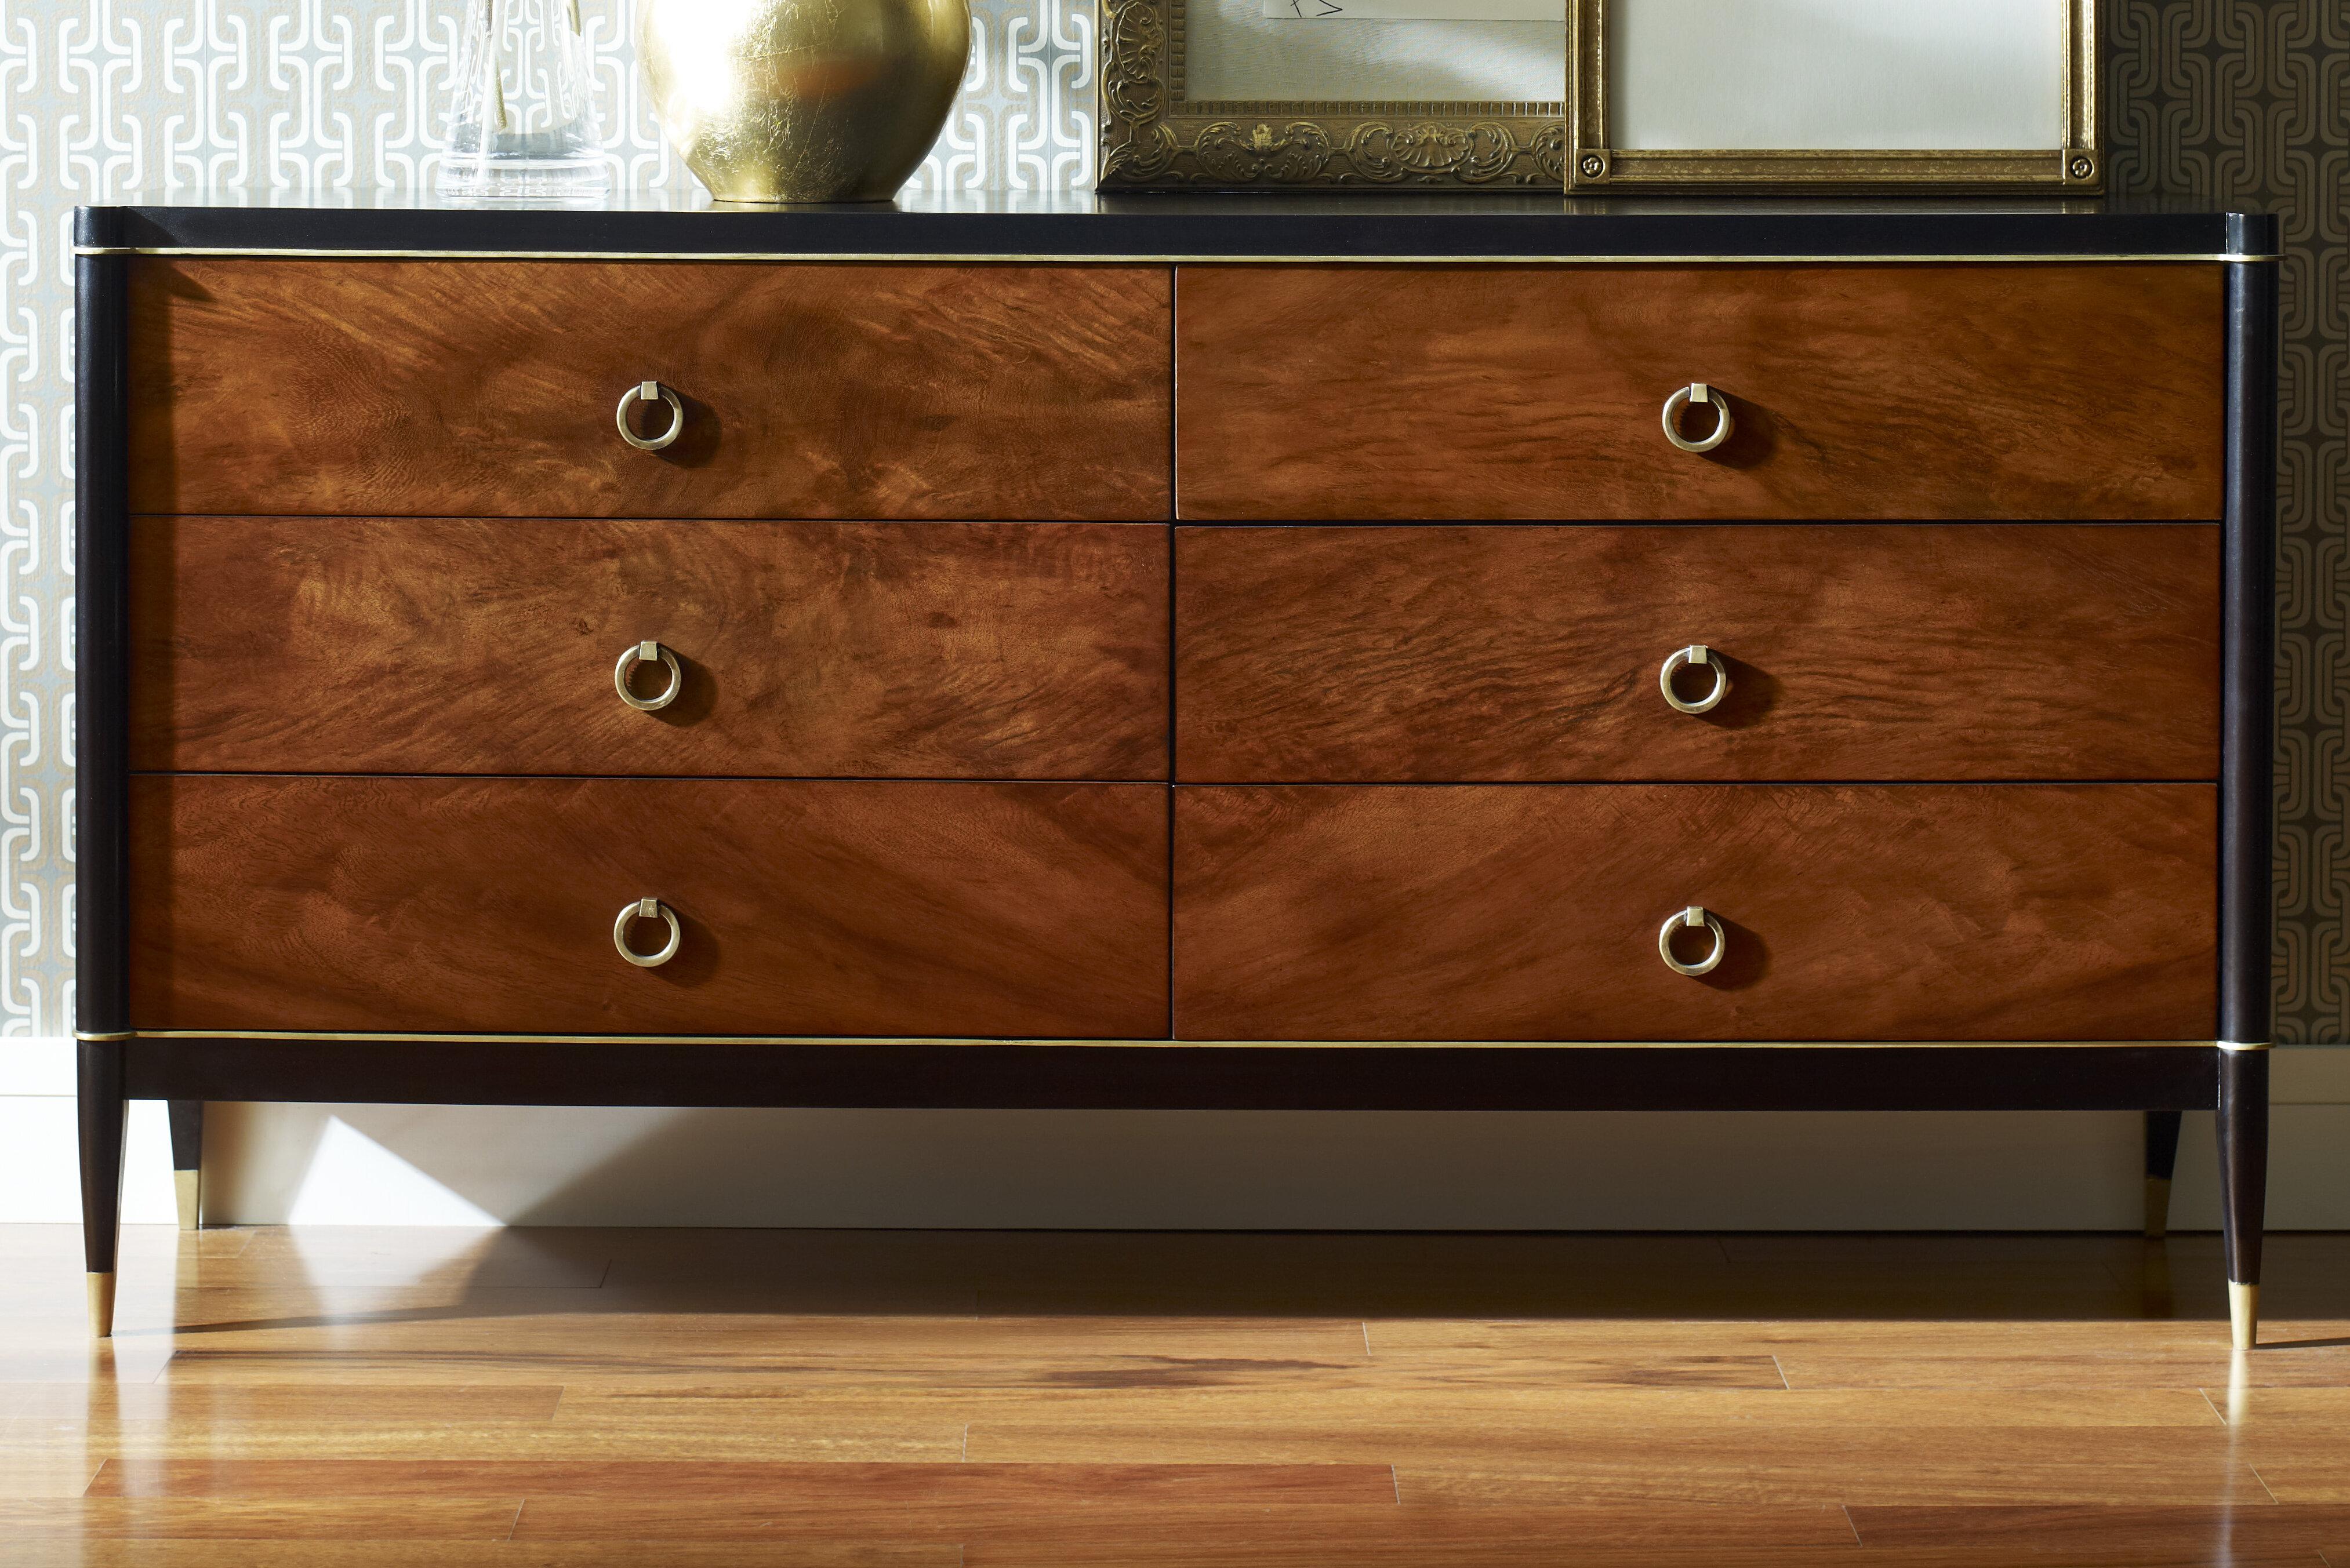 Brownstone Furniture Davenport 6 Drawer Double Dresser | Wayfair